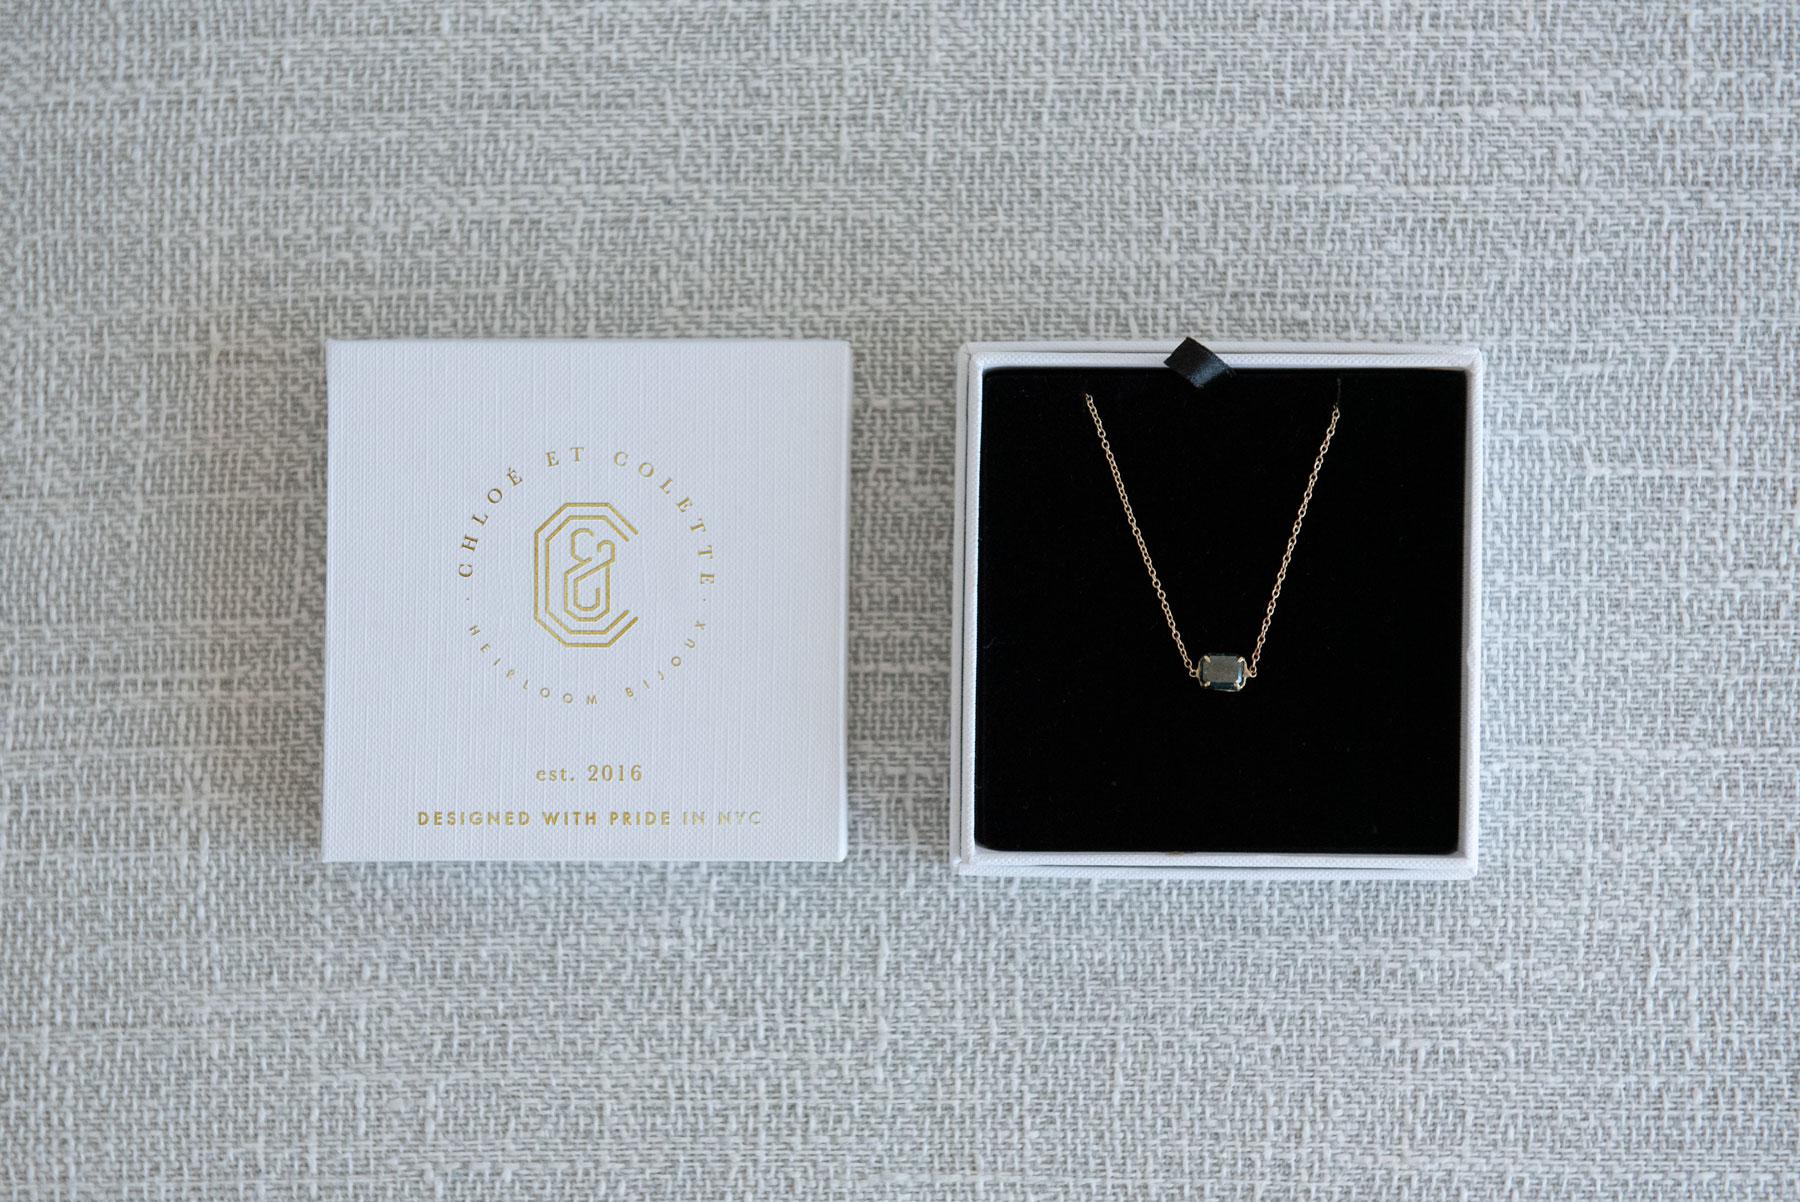 Chloe_Et_Colette_vidhi_dattani_jewelry_box_big.jpg